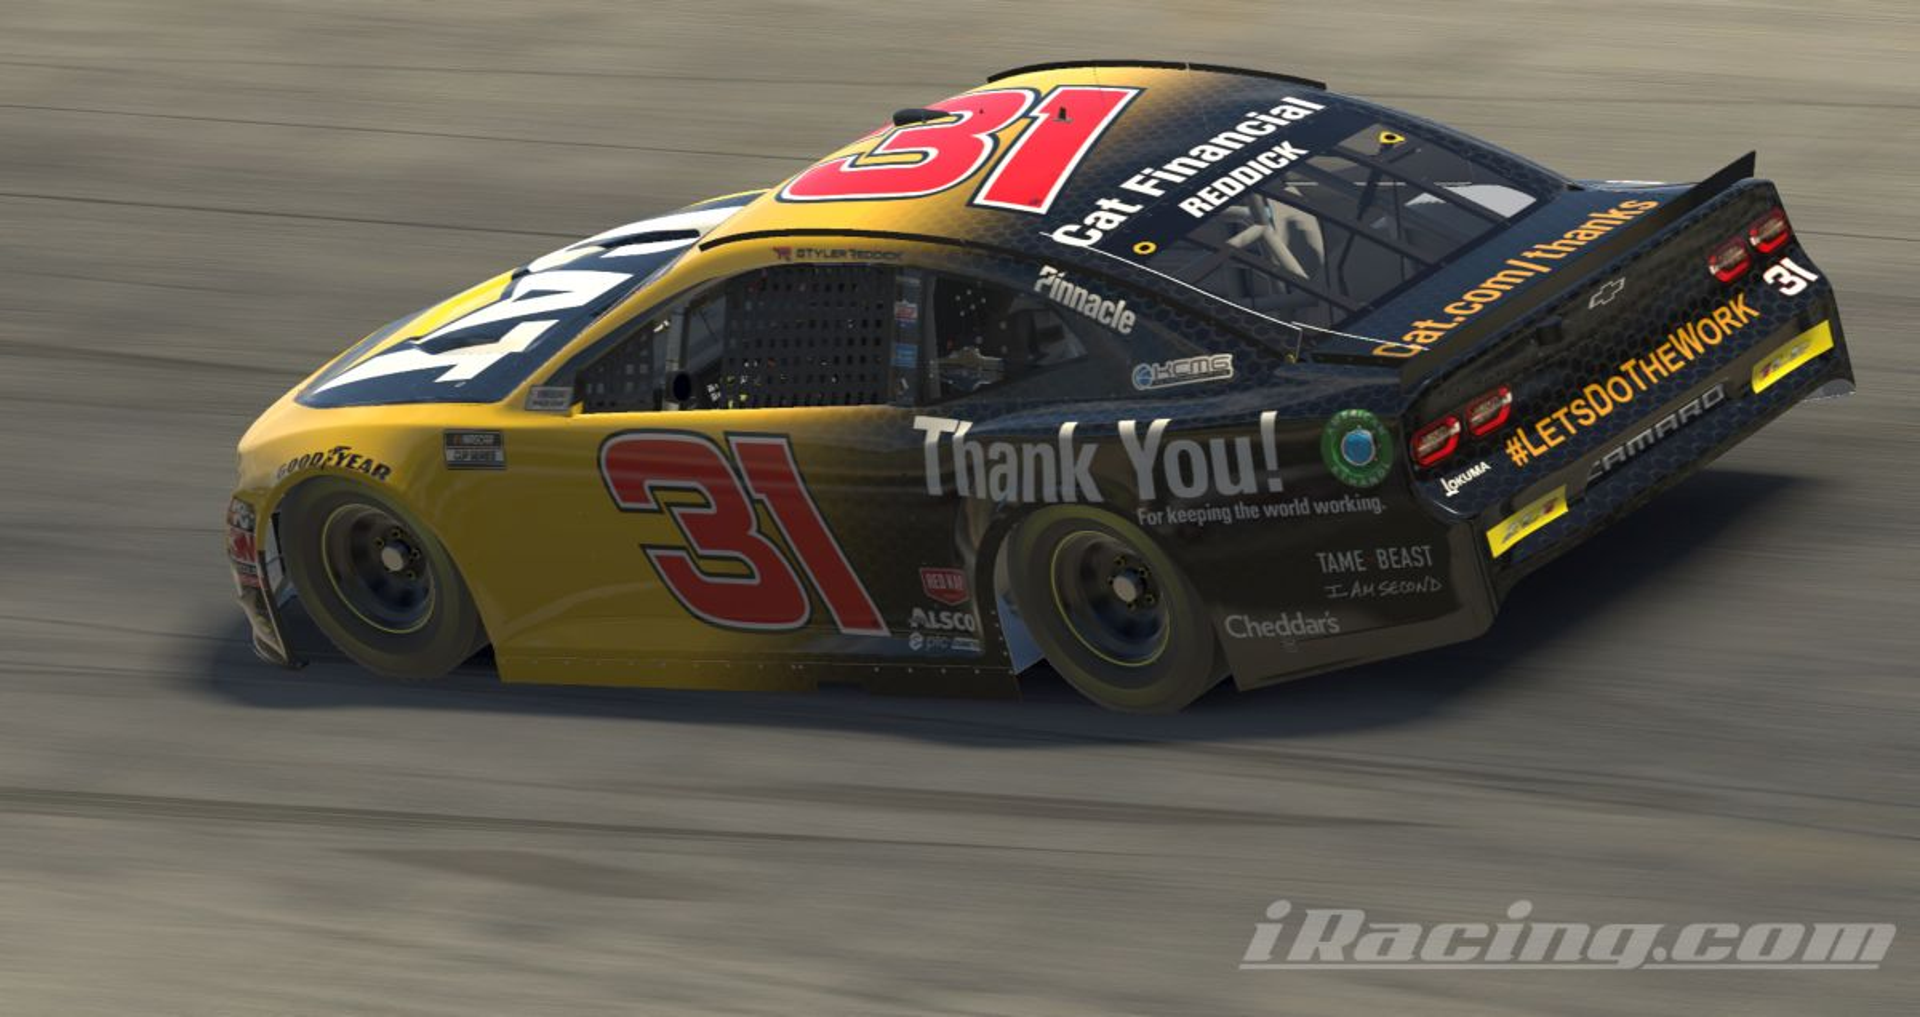 Thank You Car